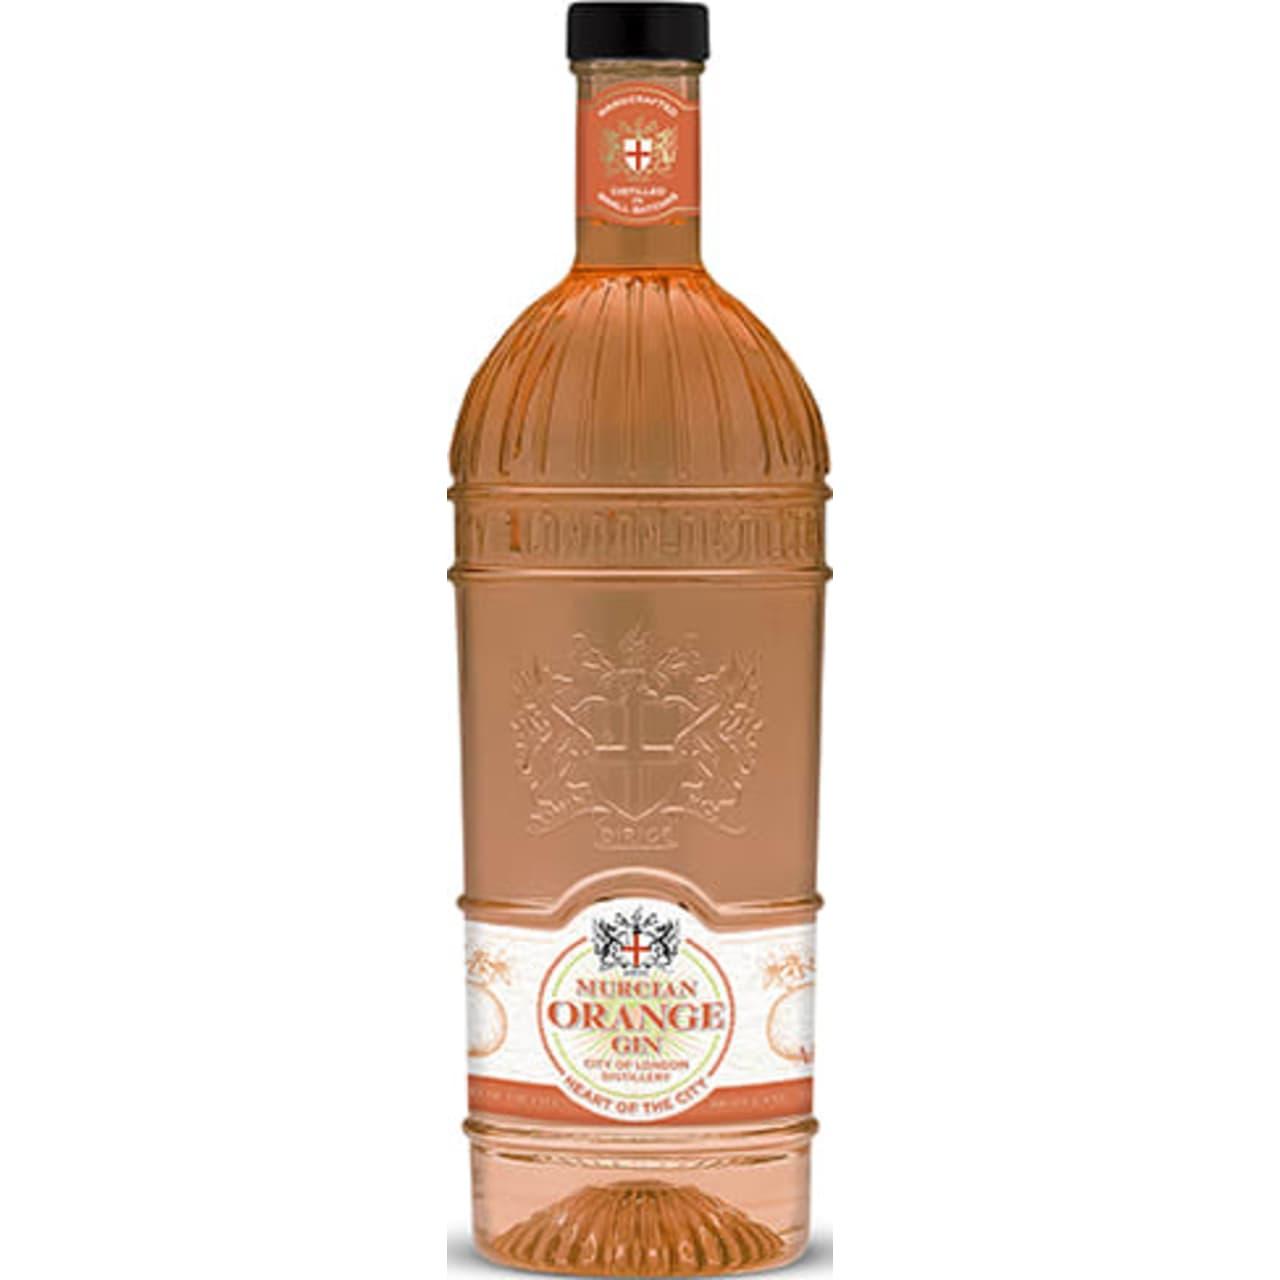 Product Image - City of London Murcian Orange Gin